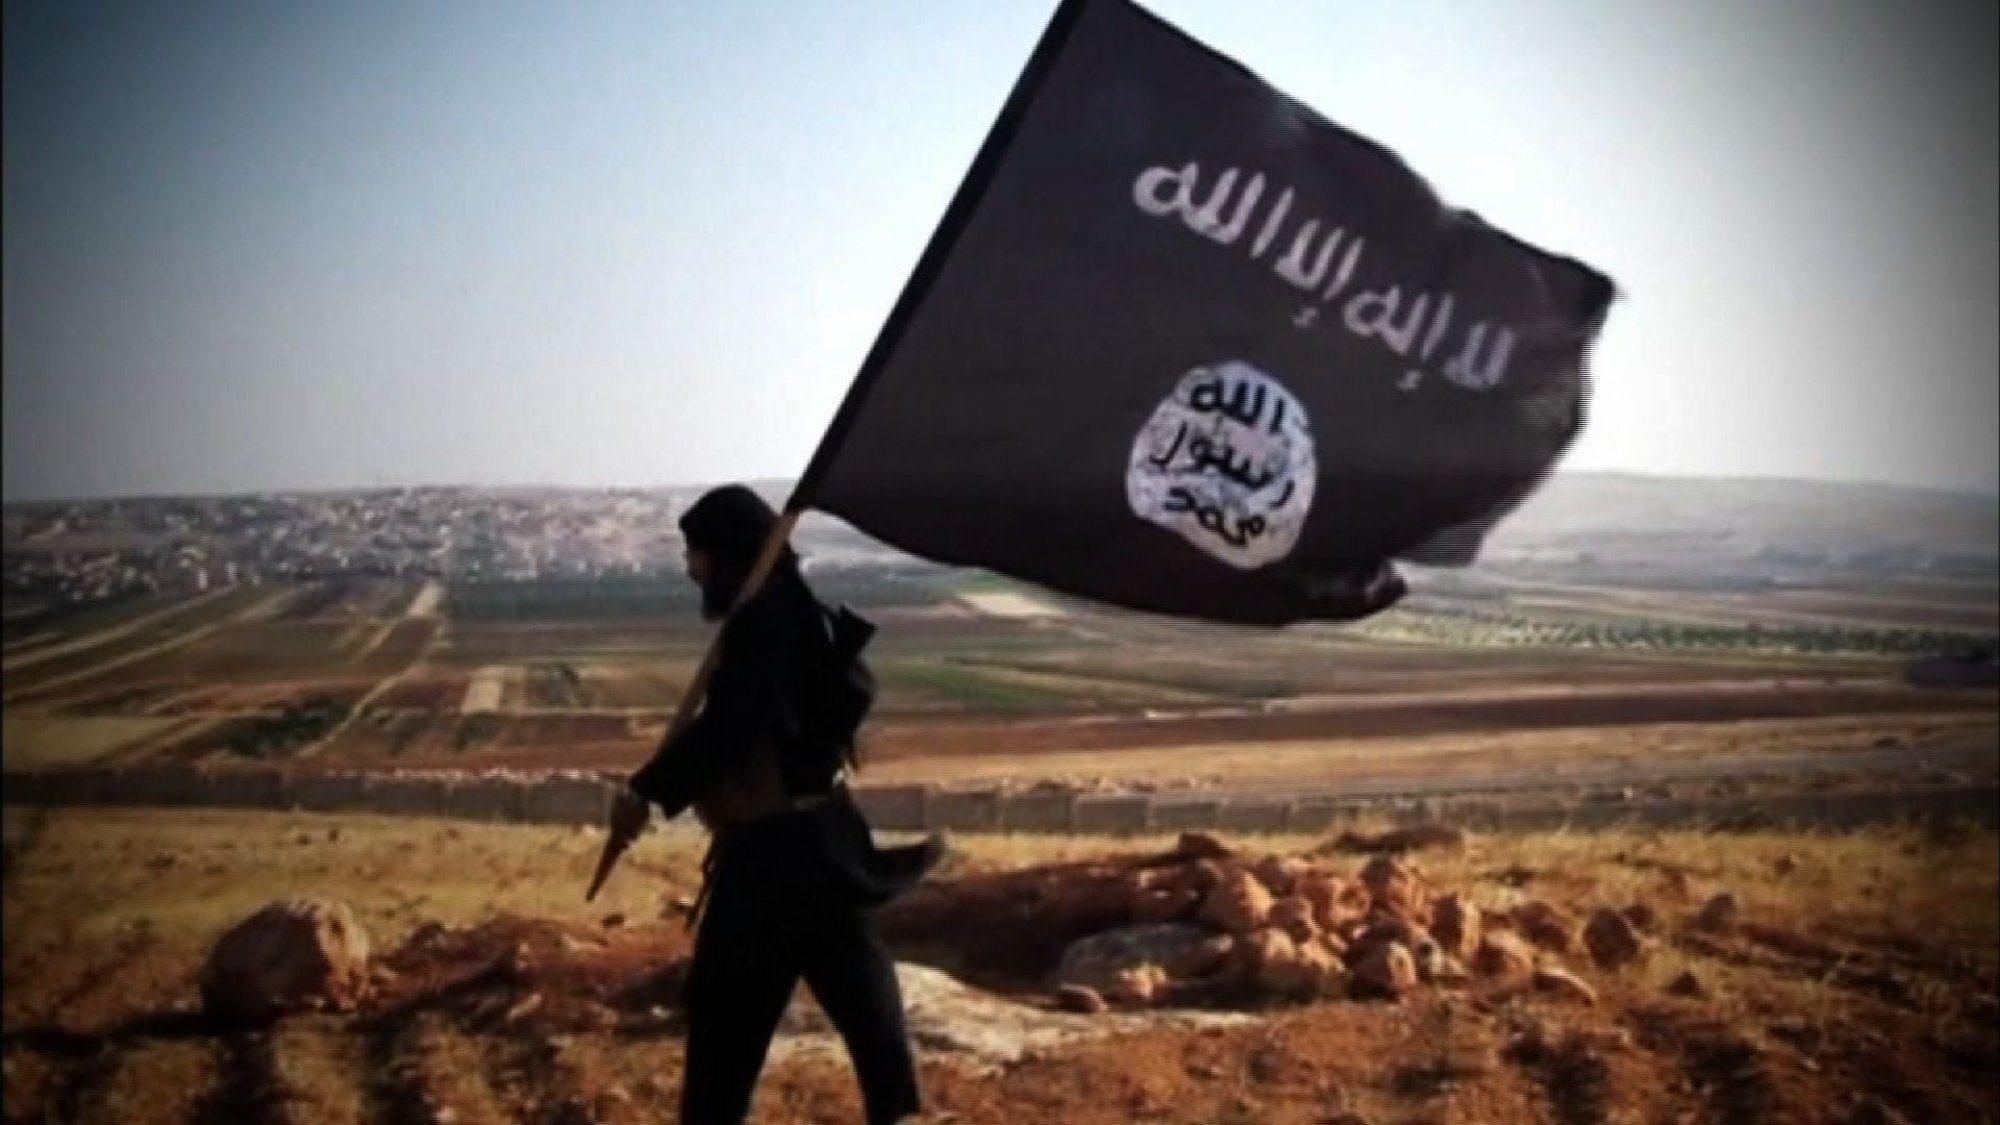 Image ISIS flag